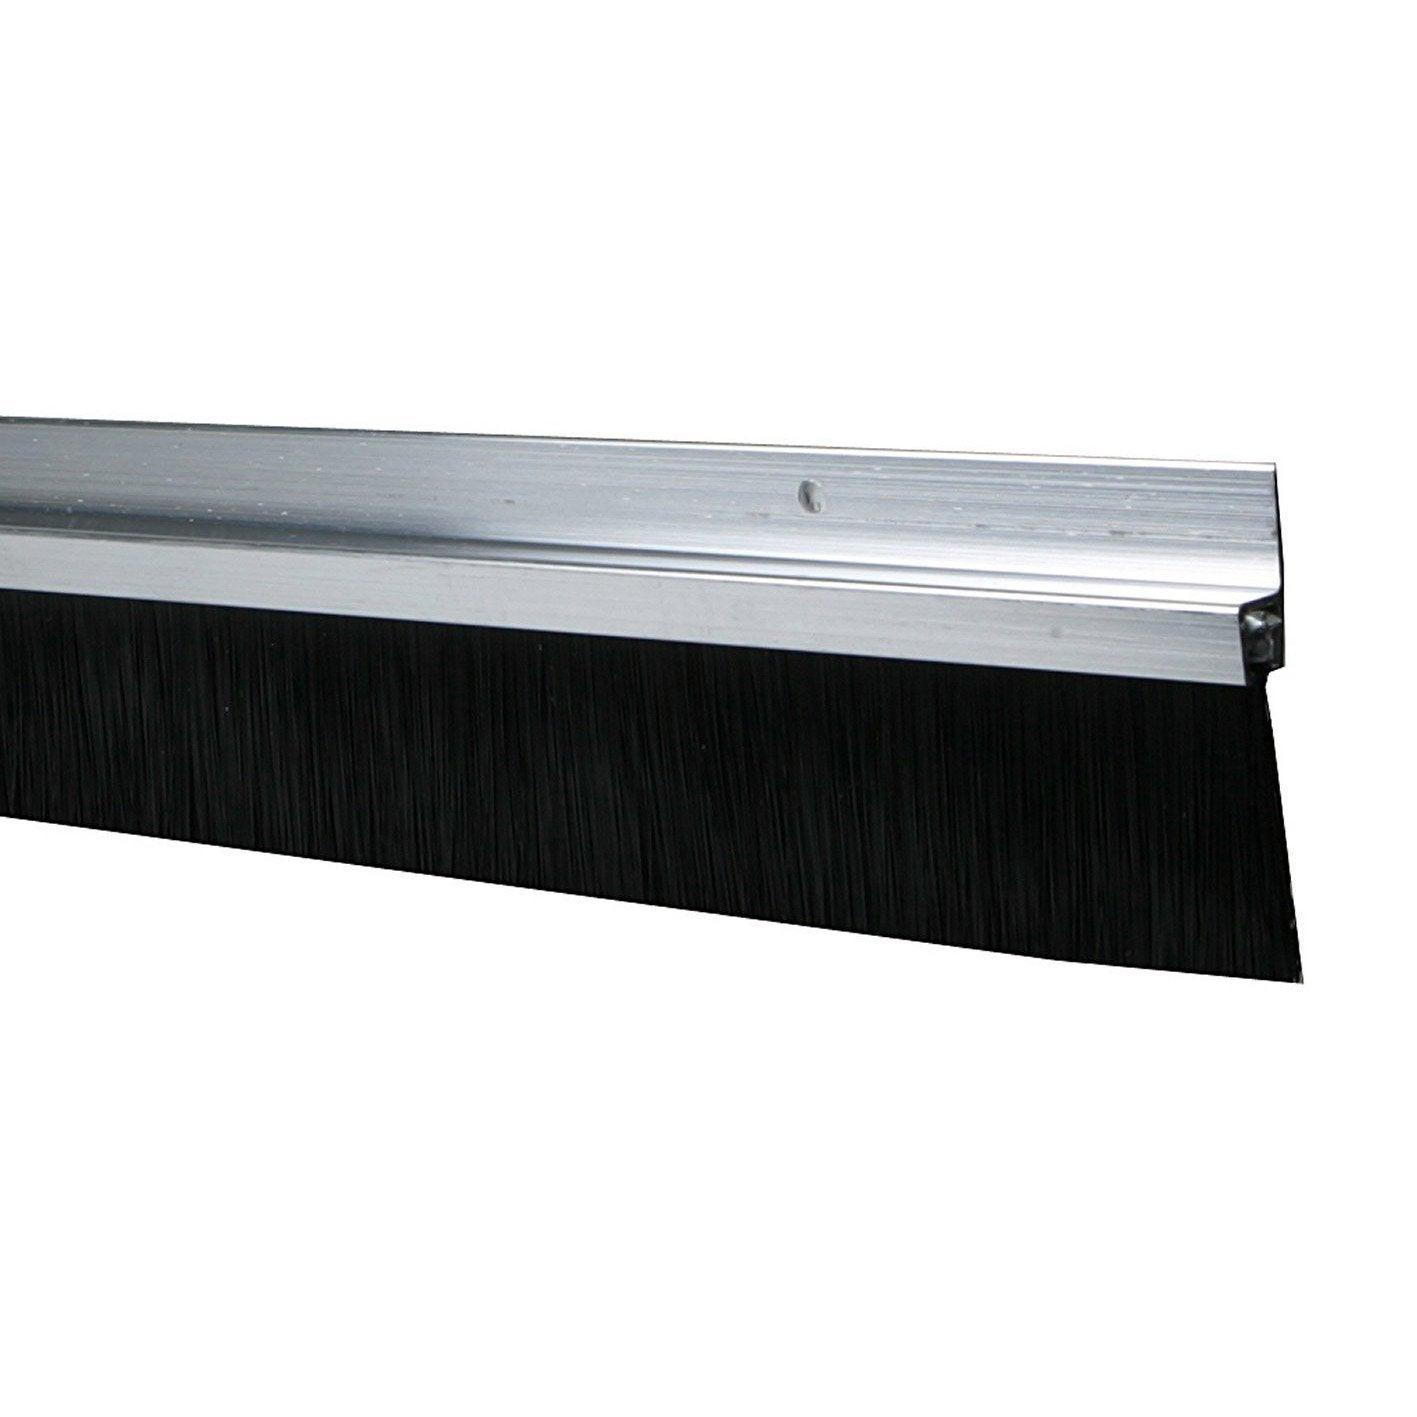 Bas de porte visser brosse axton cm aluminium - Seuil de porte alu brosse ...